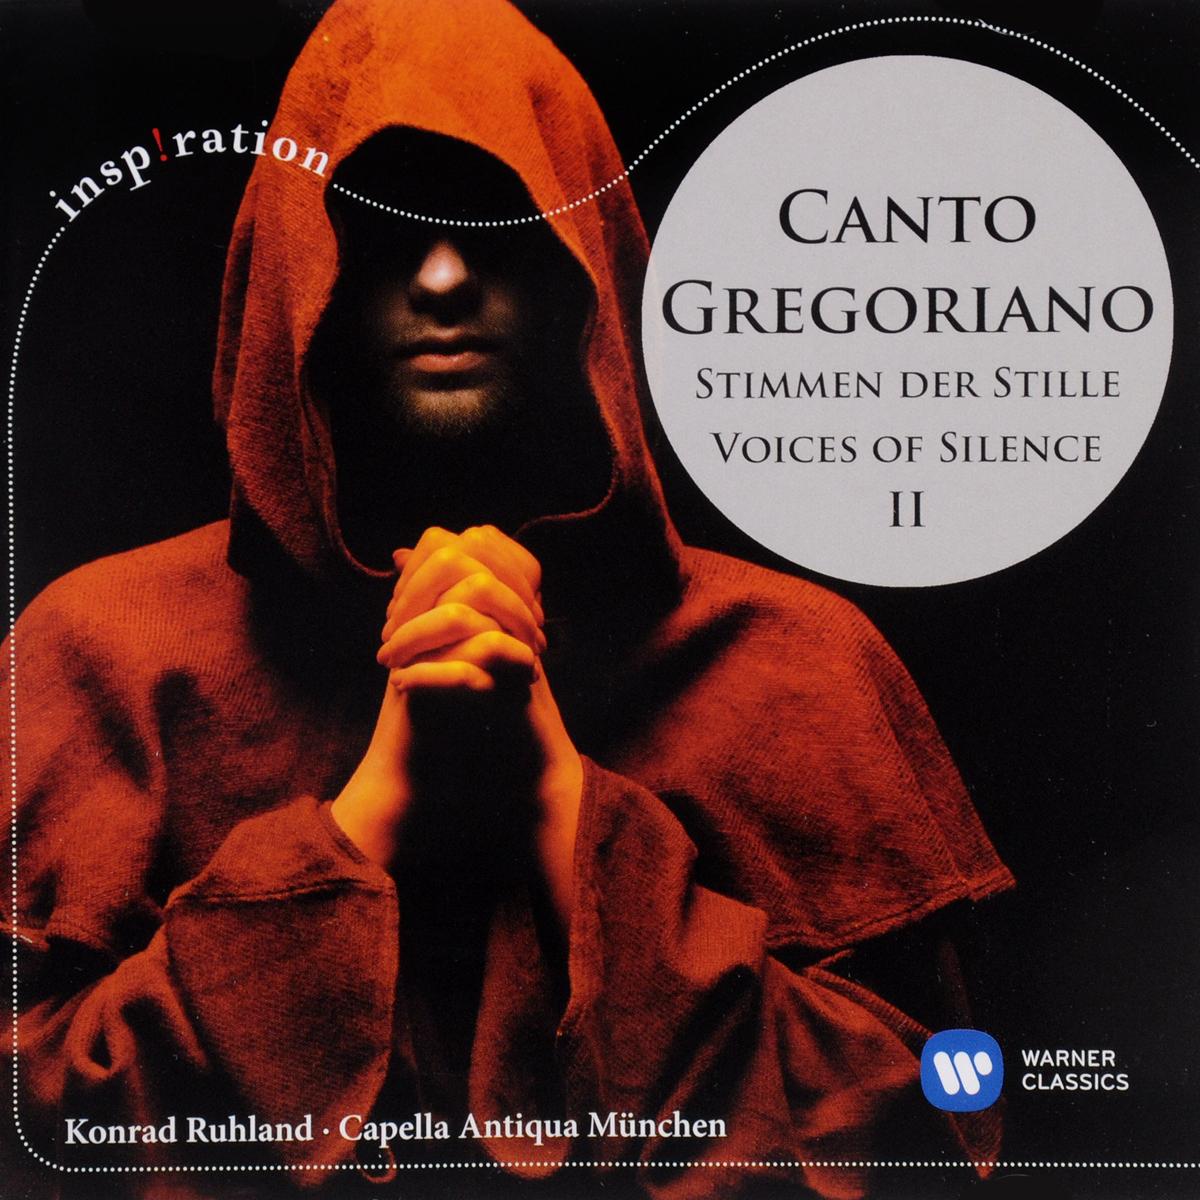 Capella Antiqua Munchen,Конрад Рухланд Capella Antiqua Munchen, Konrad Ruhland. Canto Gregoriano 2 самокат capella